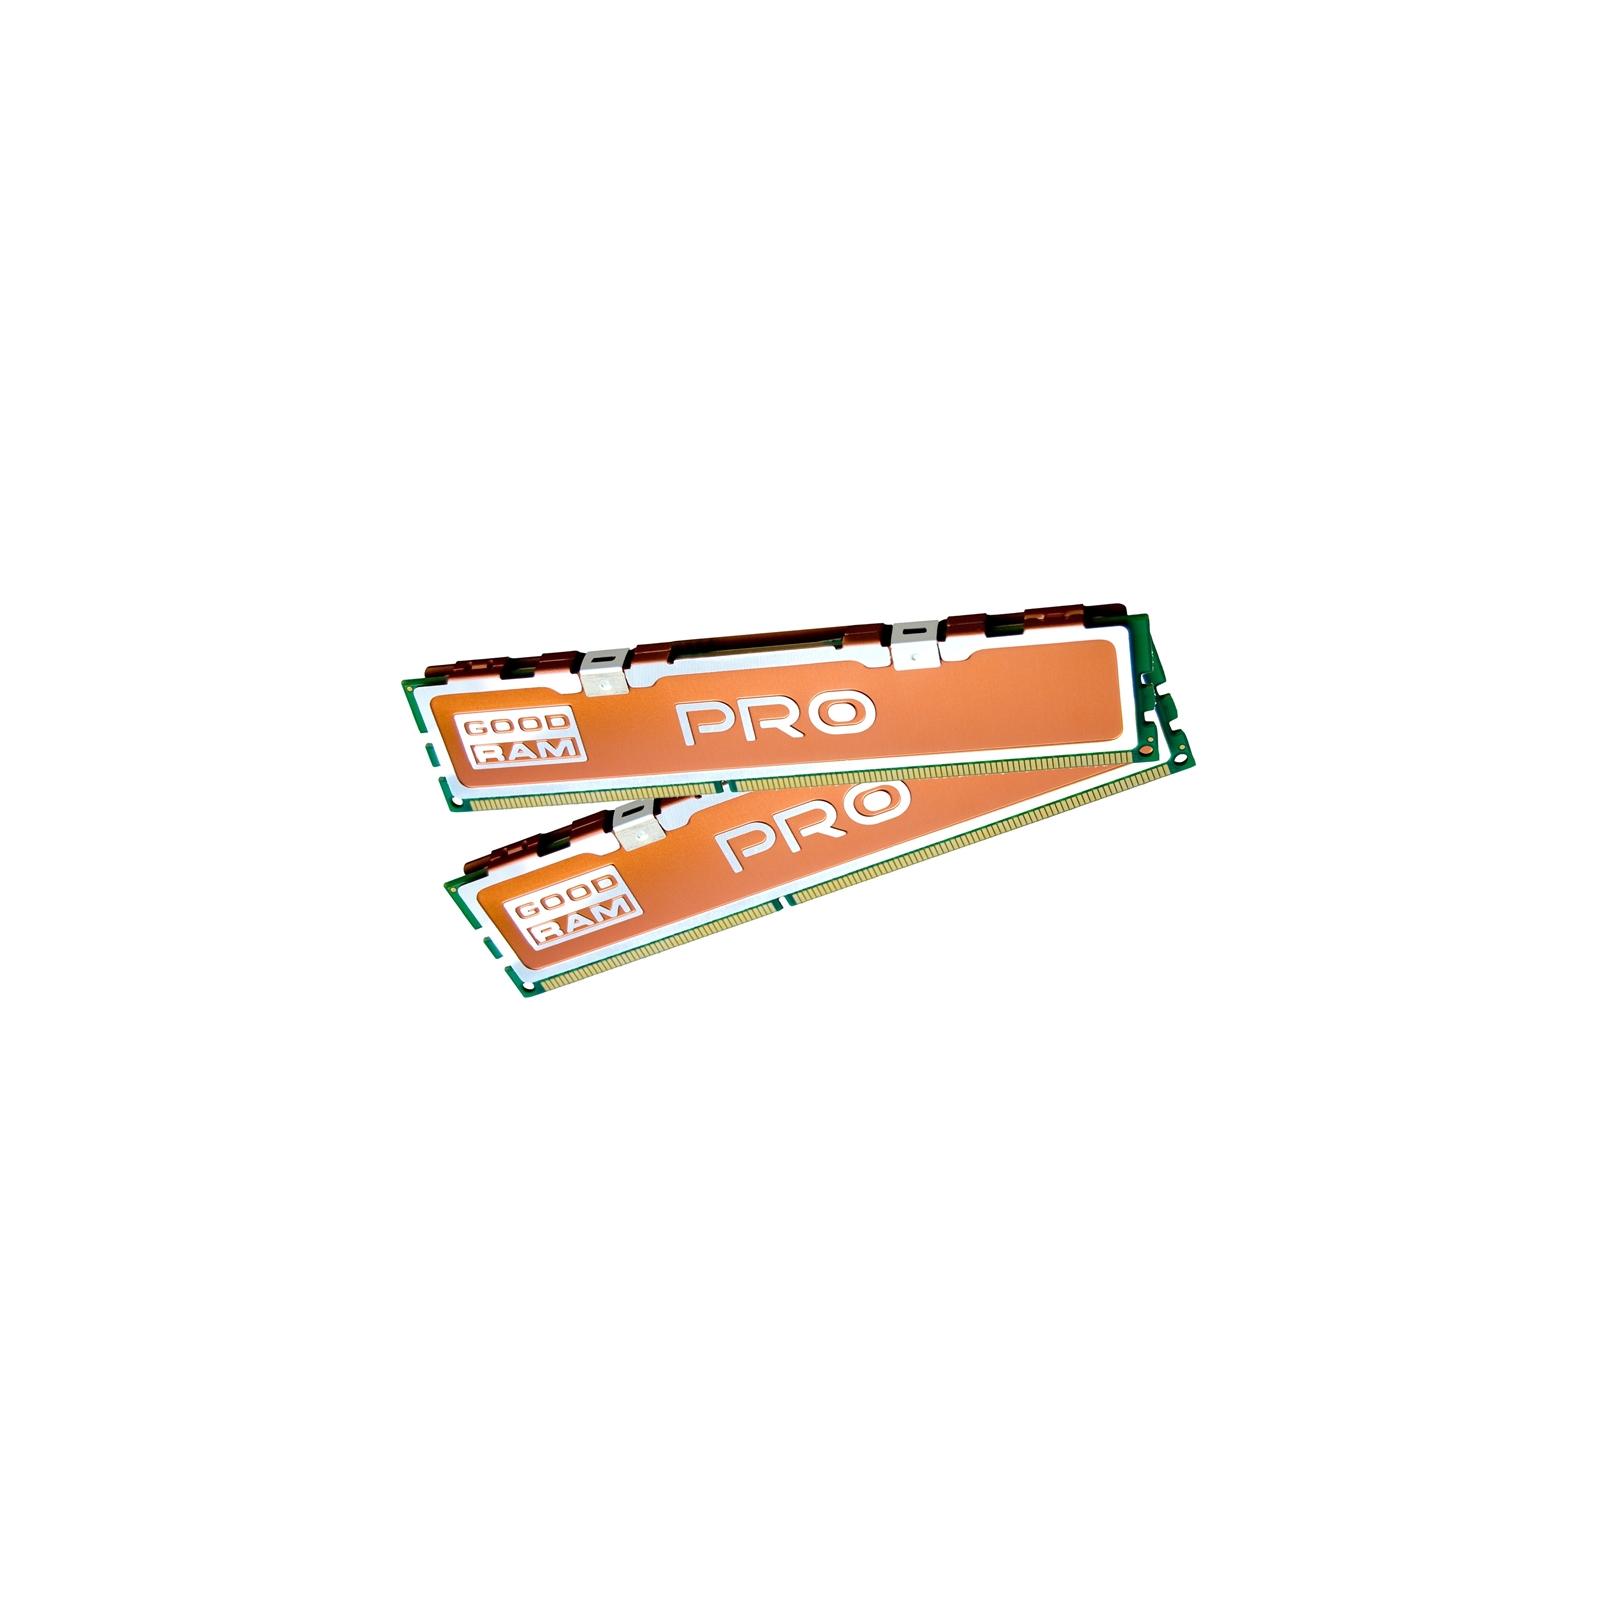 Модуль памяти для компьютера DDR3 8Gb (2x4GB) 2133 MHz PRO GOODRAM (GP2133D364L10AS/8GDC) изображение 3